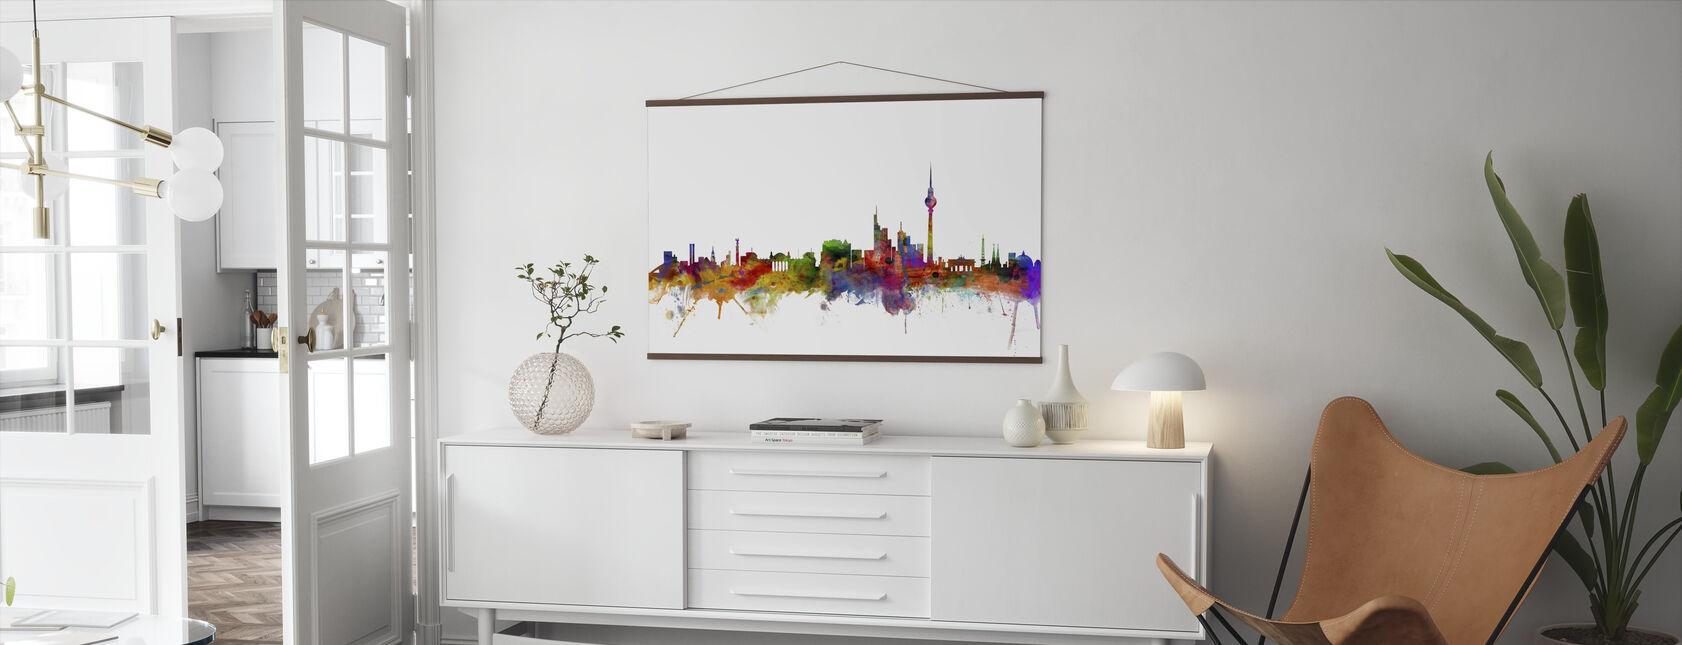 Berlin Skyline - Poster - Living Room